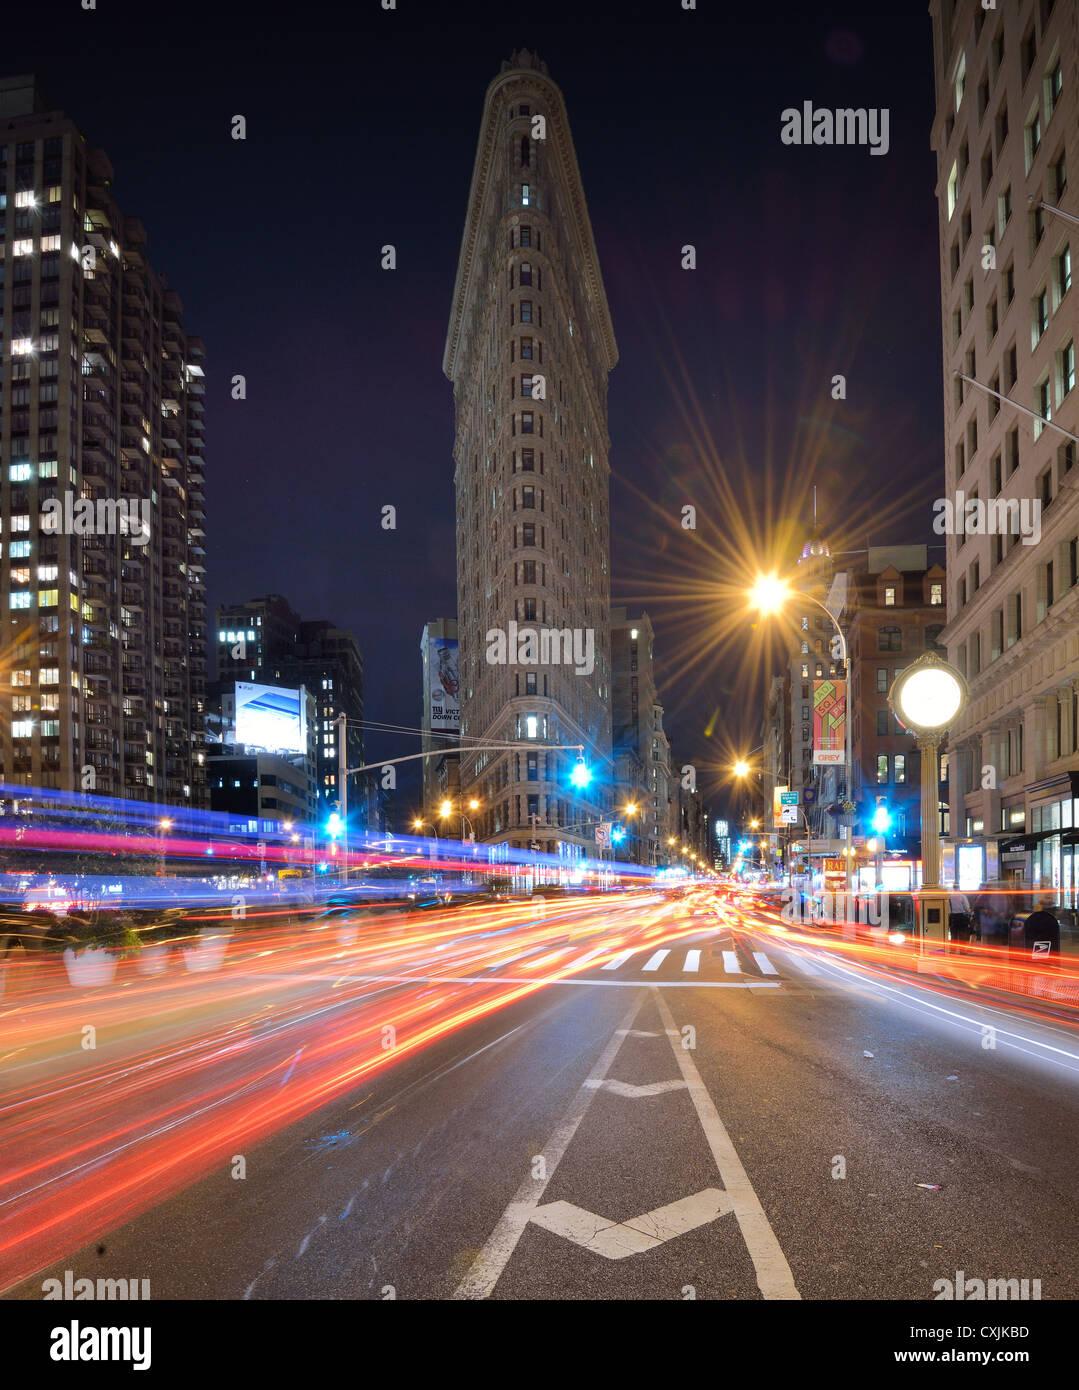 Flatiron Building in New York City - Stock Image